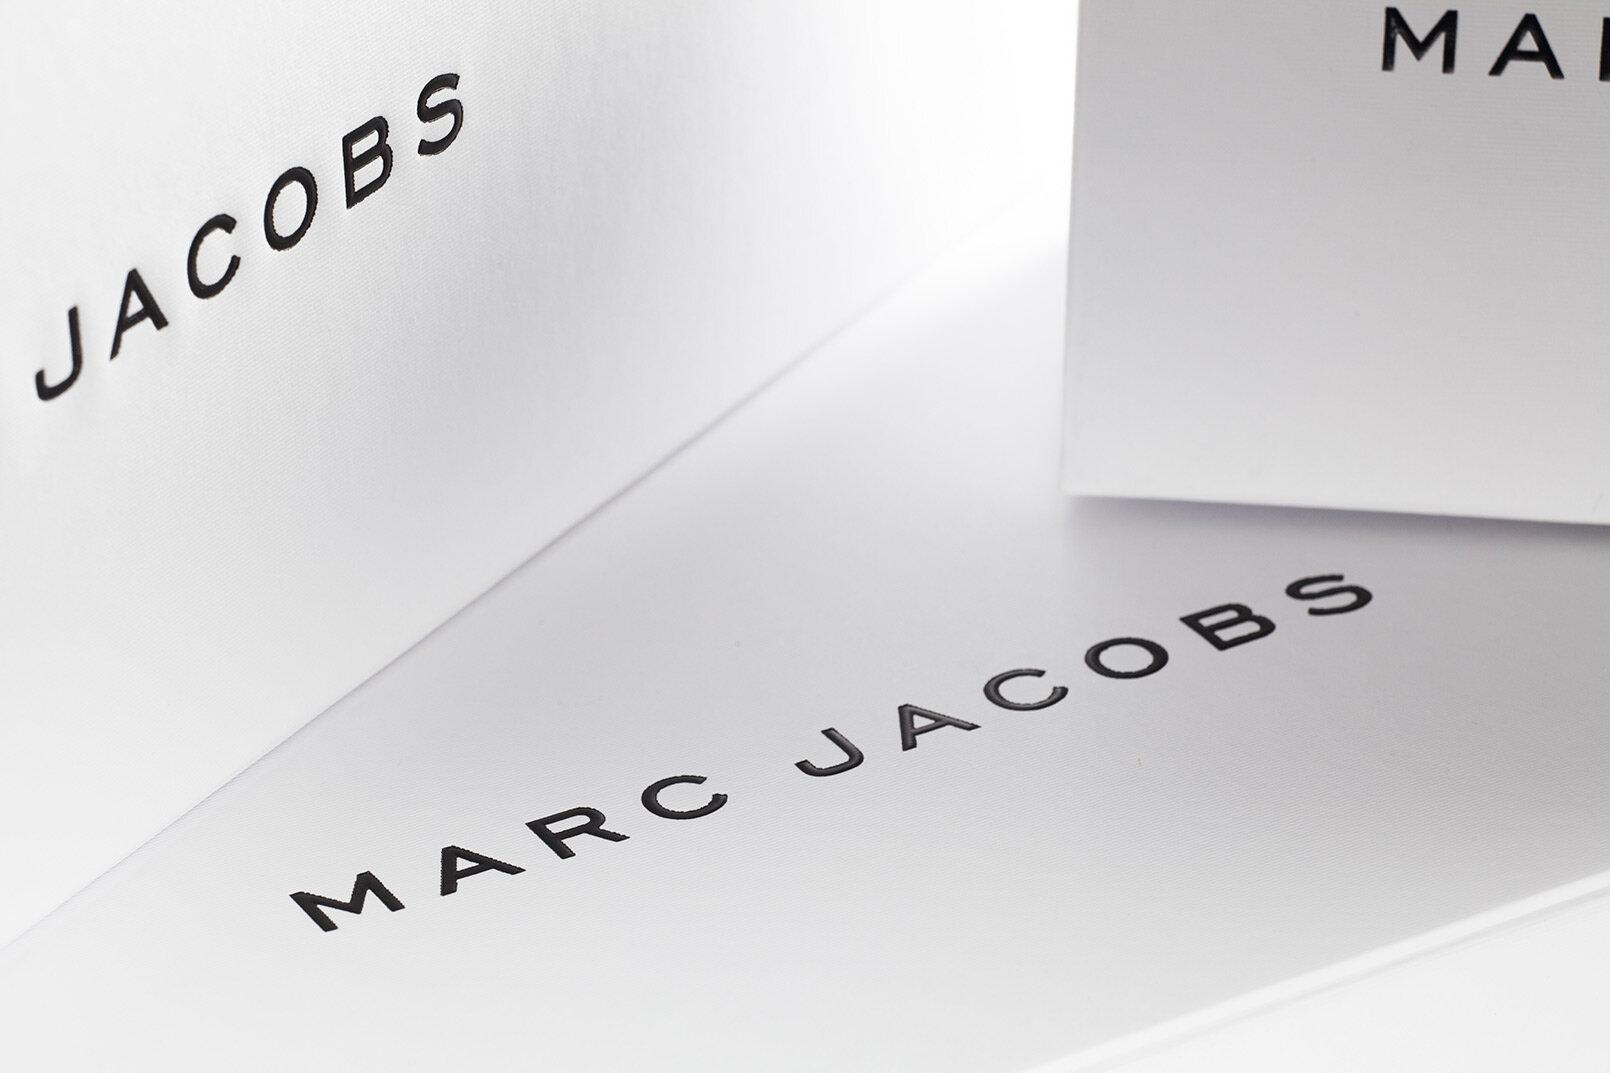 MARC-JACOBS-刚性箱式设计 - 包装 - 公司-4.JPG